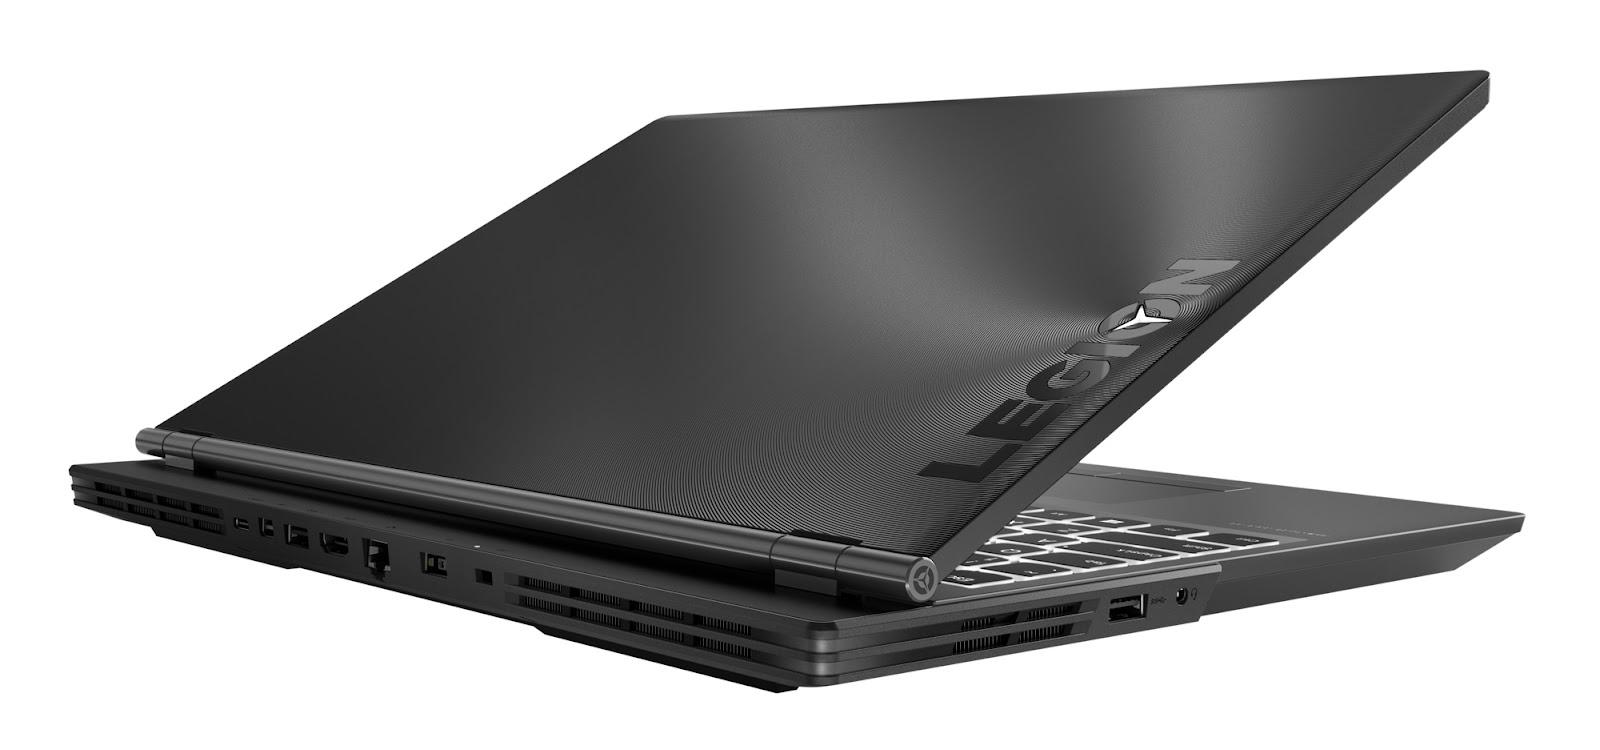 Фото 4. Ноутбук Lenovo Legion Y540-15IRH Black (81SX0141RE)